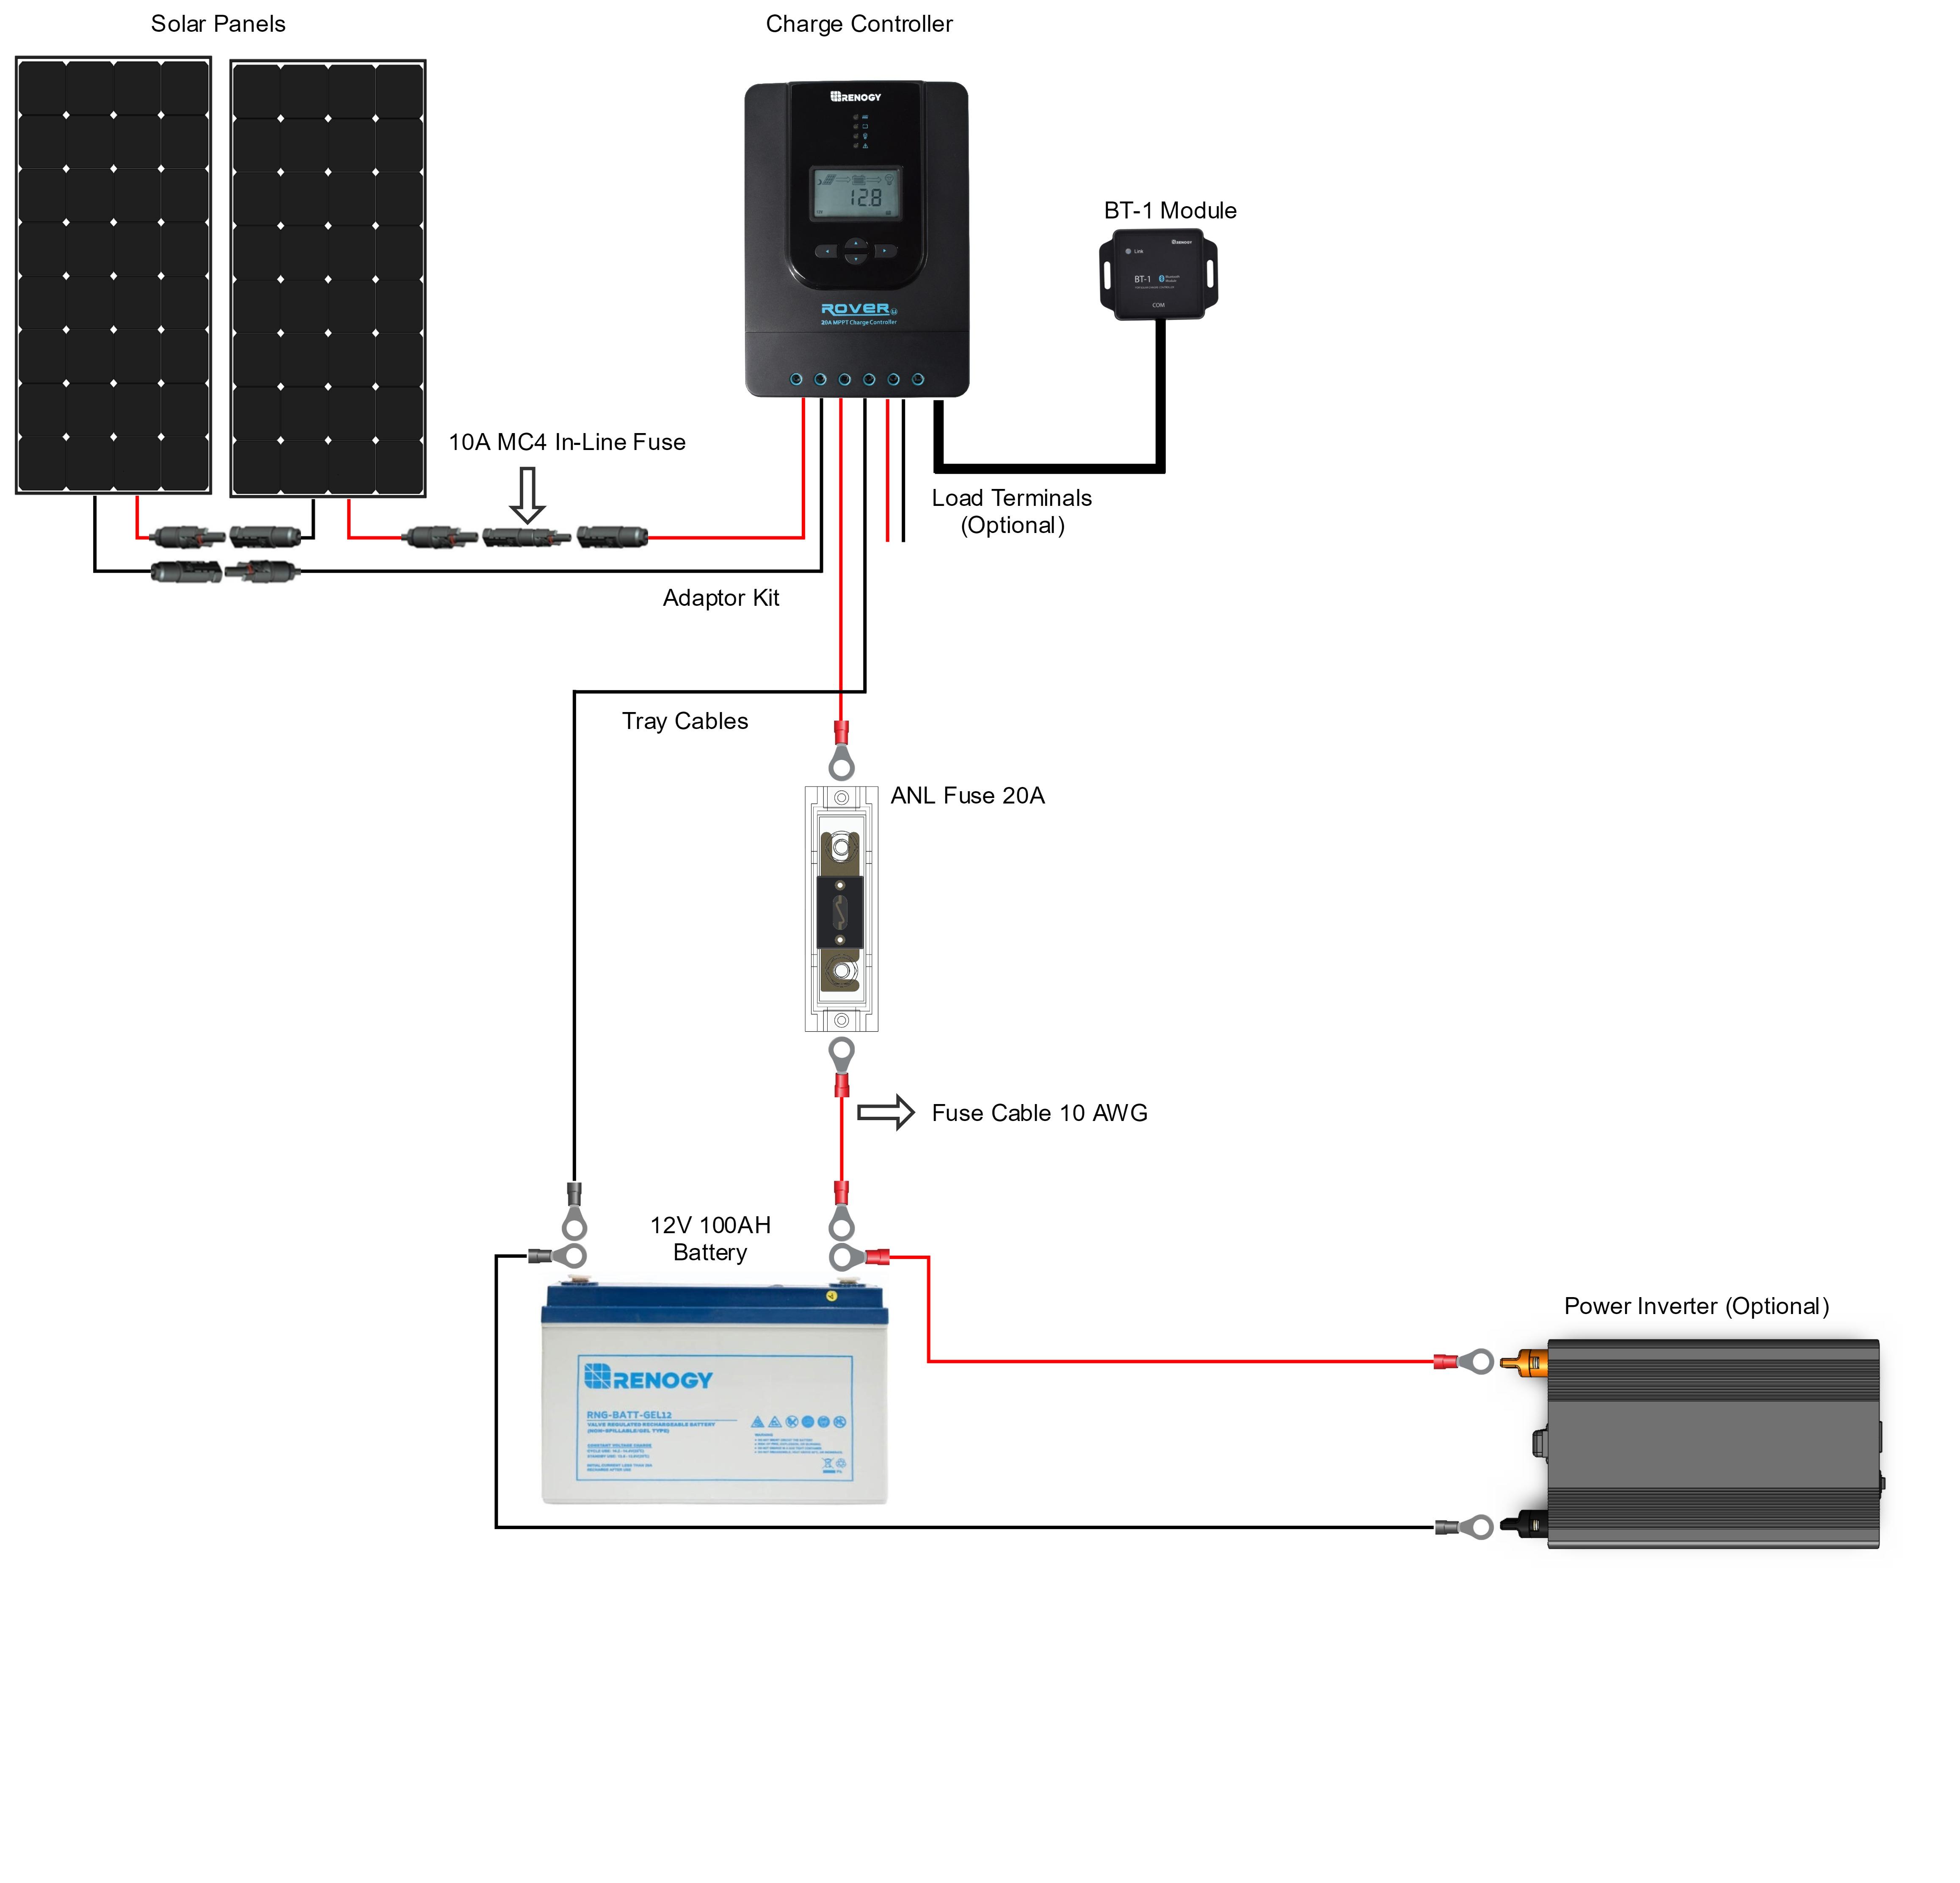 YB_2145] Renogy Wiring Diagram Free DiagramTobiq Bupi Oxyt Drosi Atolo Inrebe Mohammedshrine Librar Wiring 101